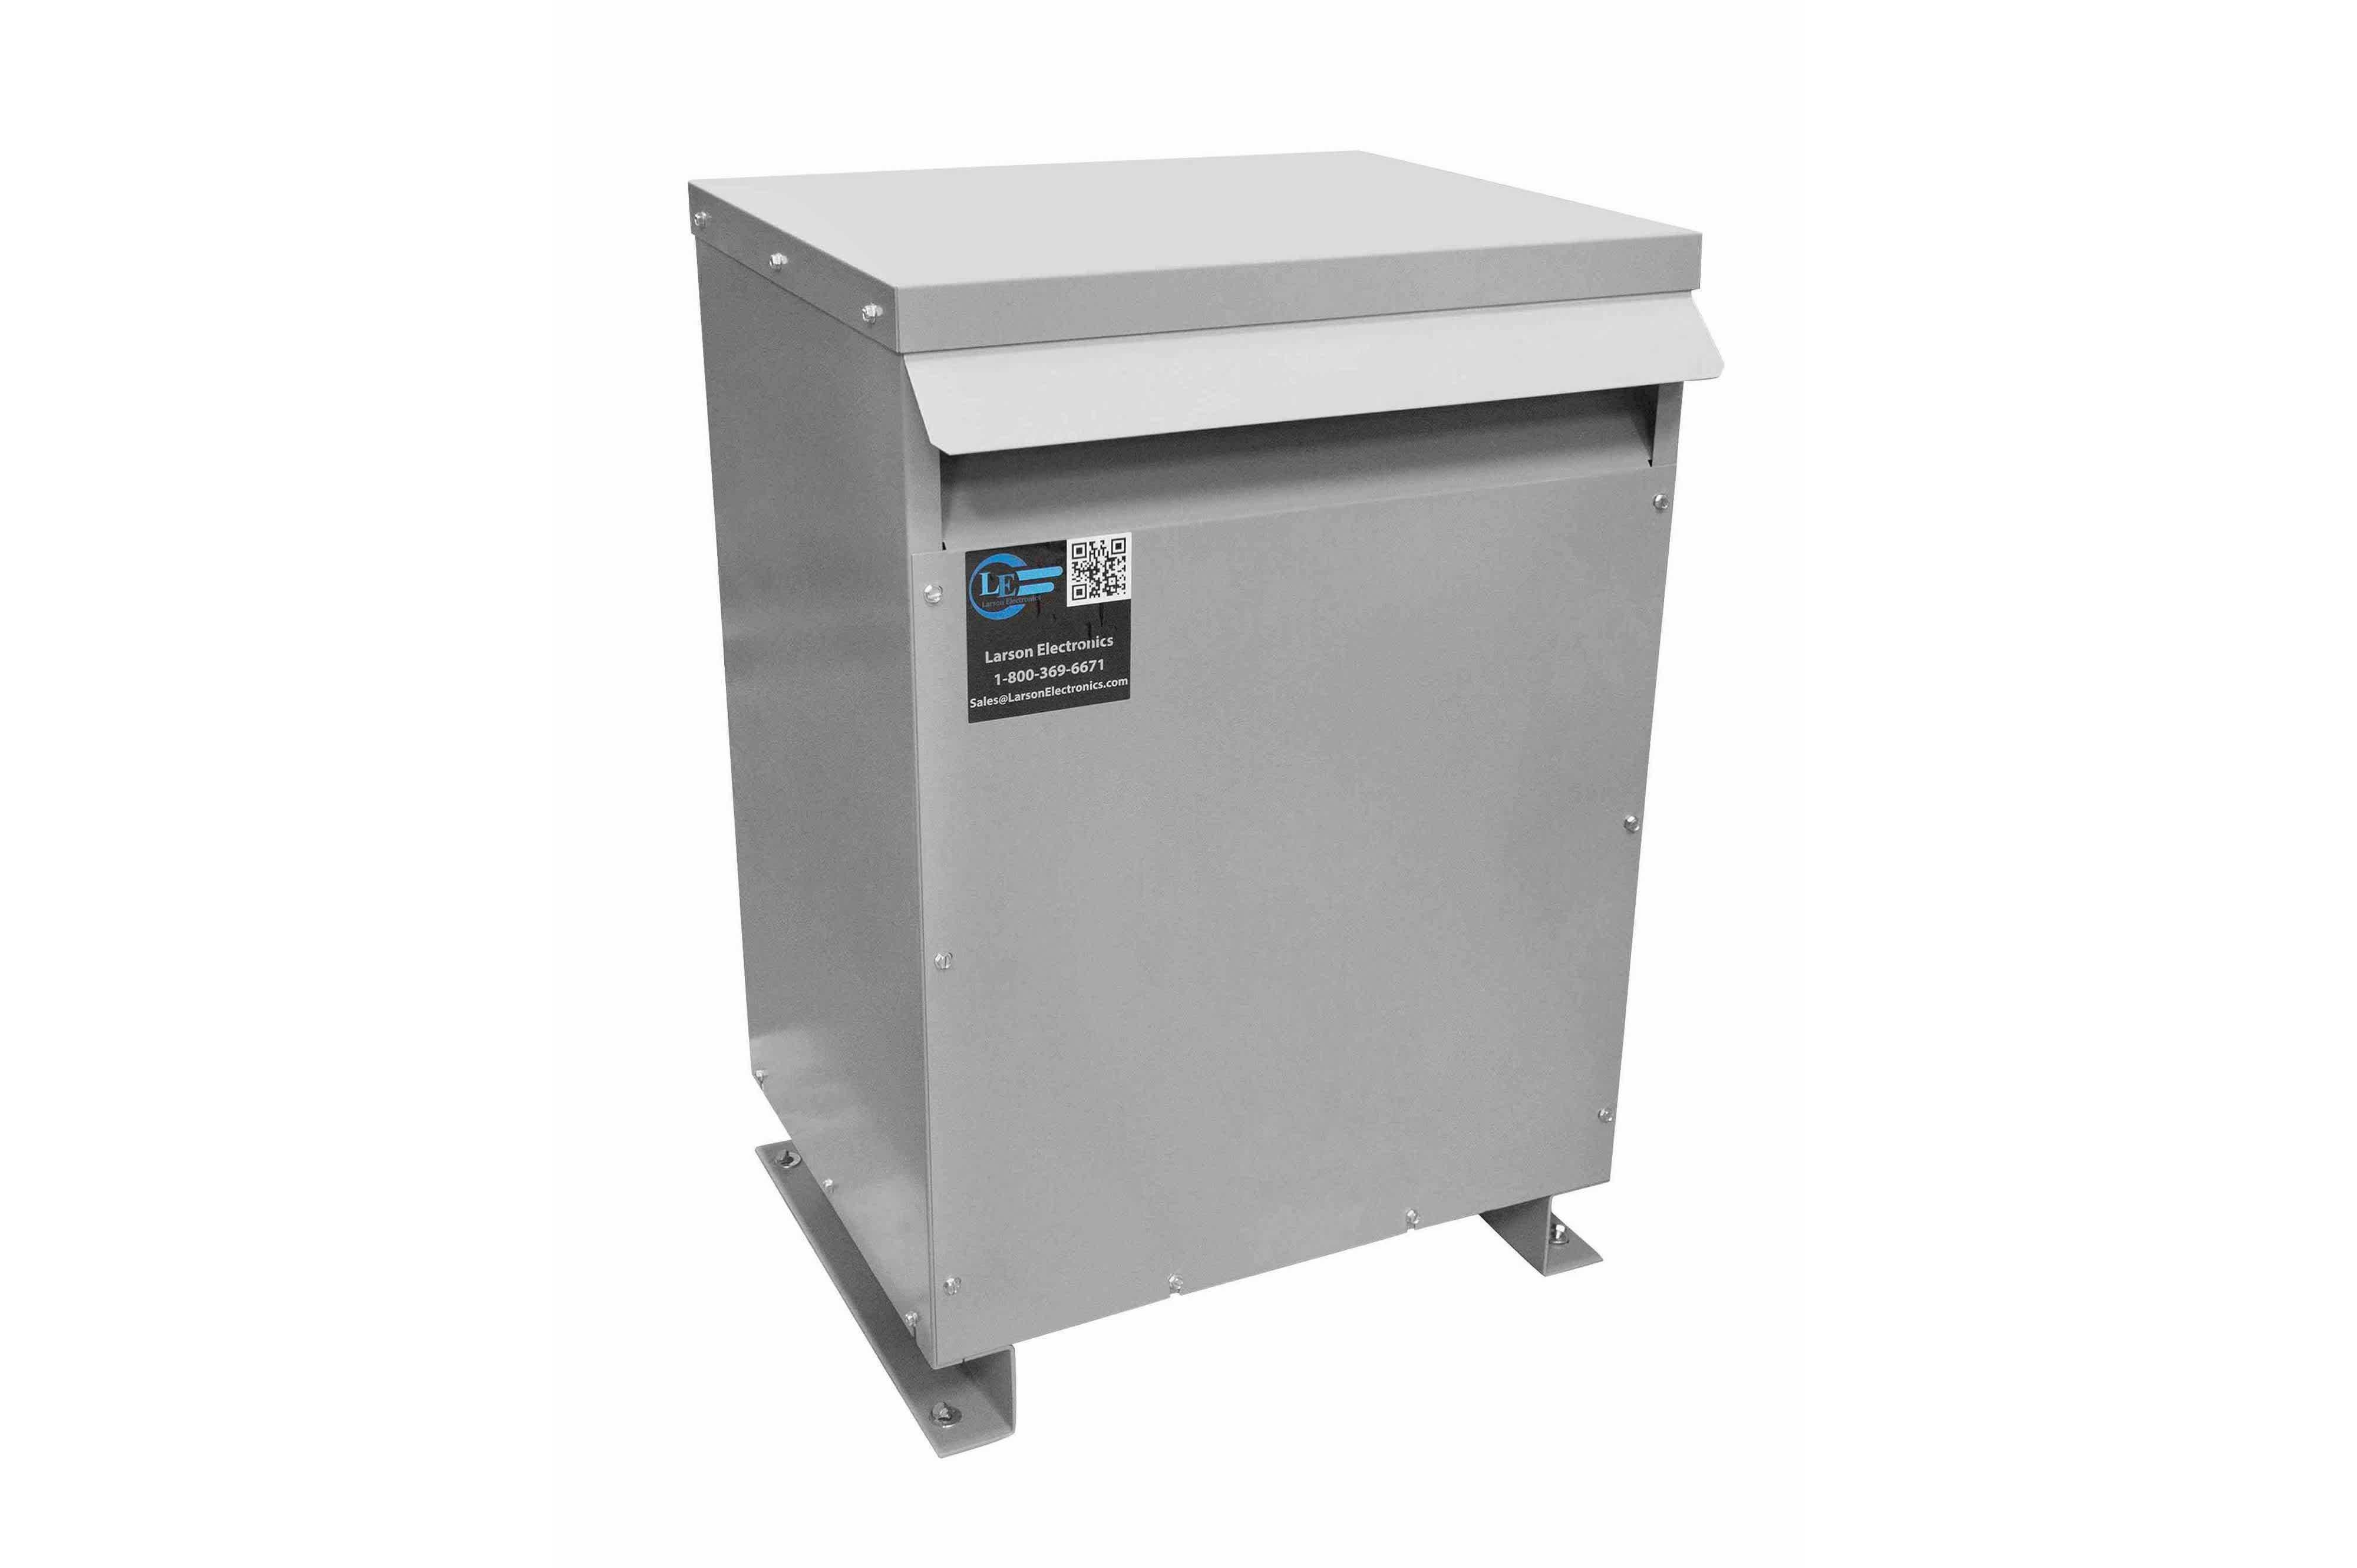 137.5 kVA 3PH Isolation Transformer, 400V Wye Primary, 480V Delta Secondary, N3R, Ventilated, 60 Hz